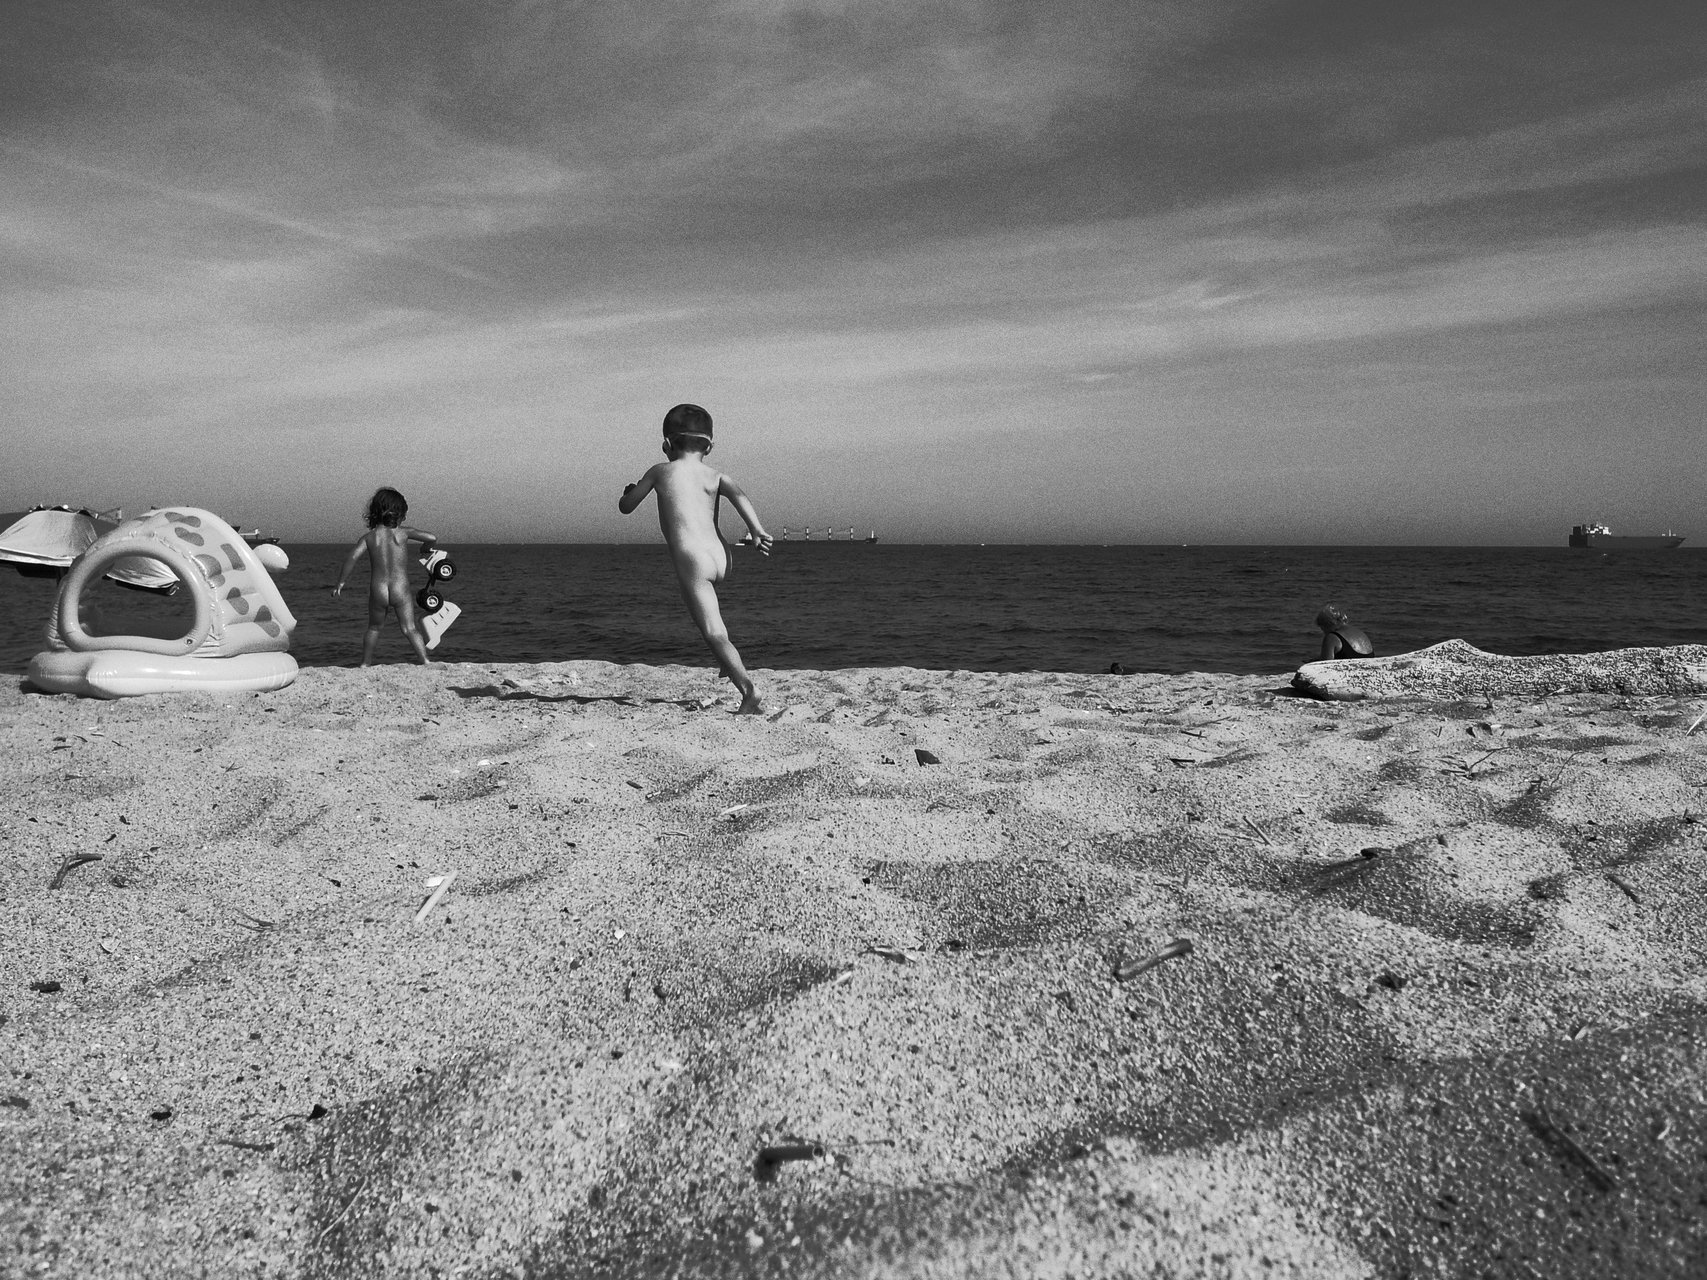 Photo in Travels | Author Martin Mihalev - martin40 | PHOTO FORUM